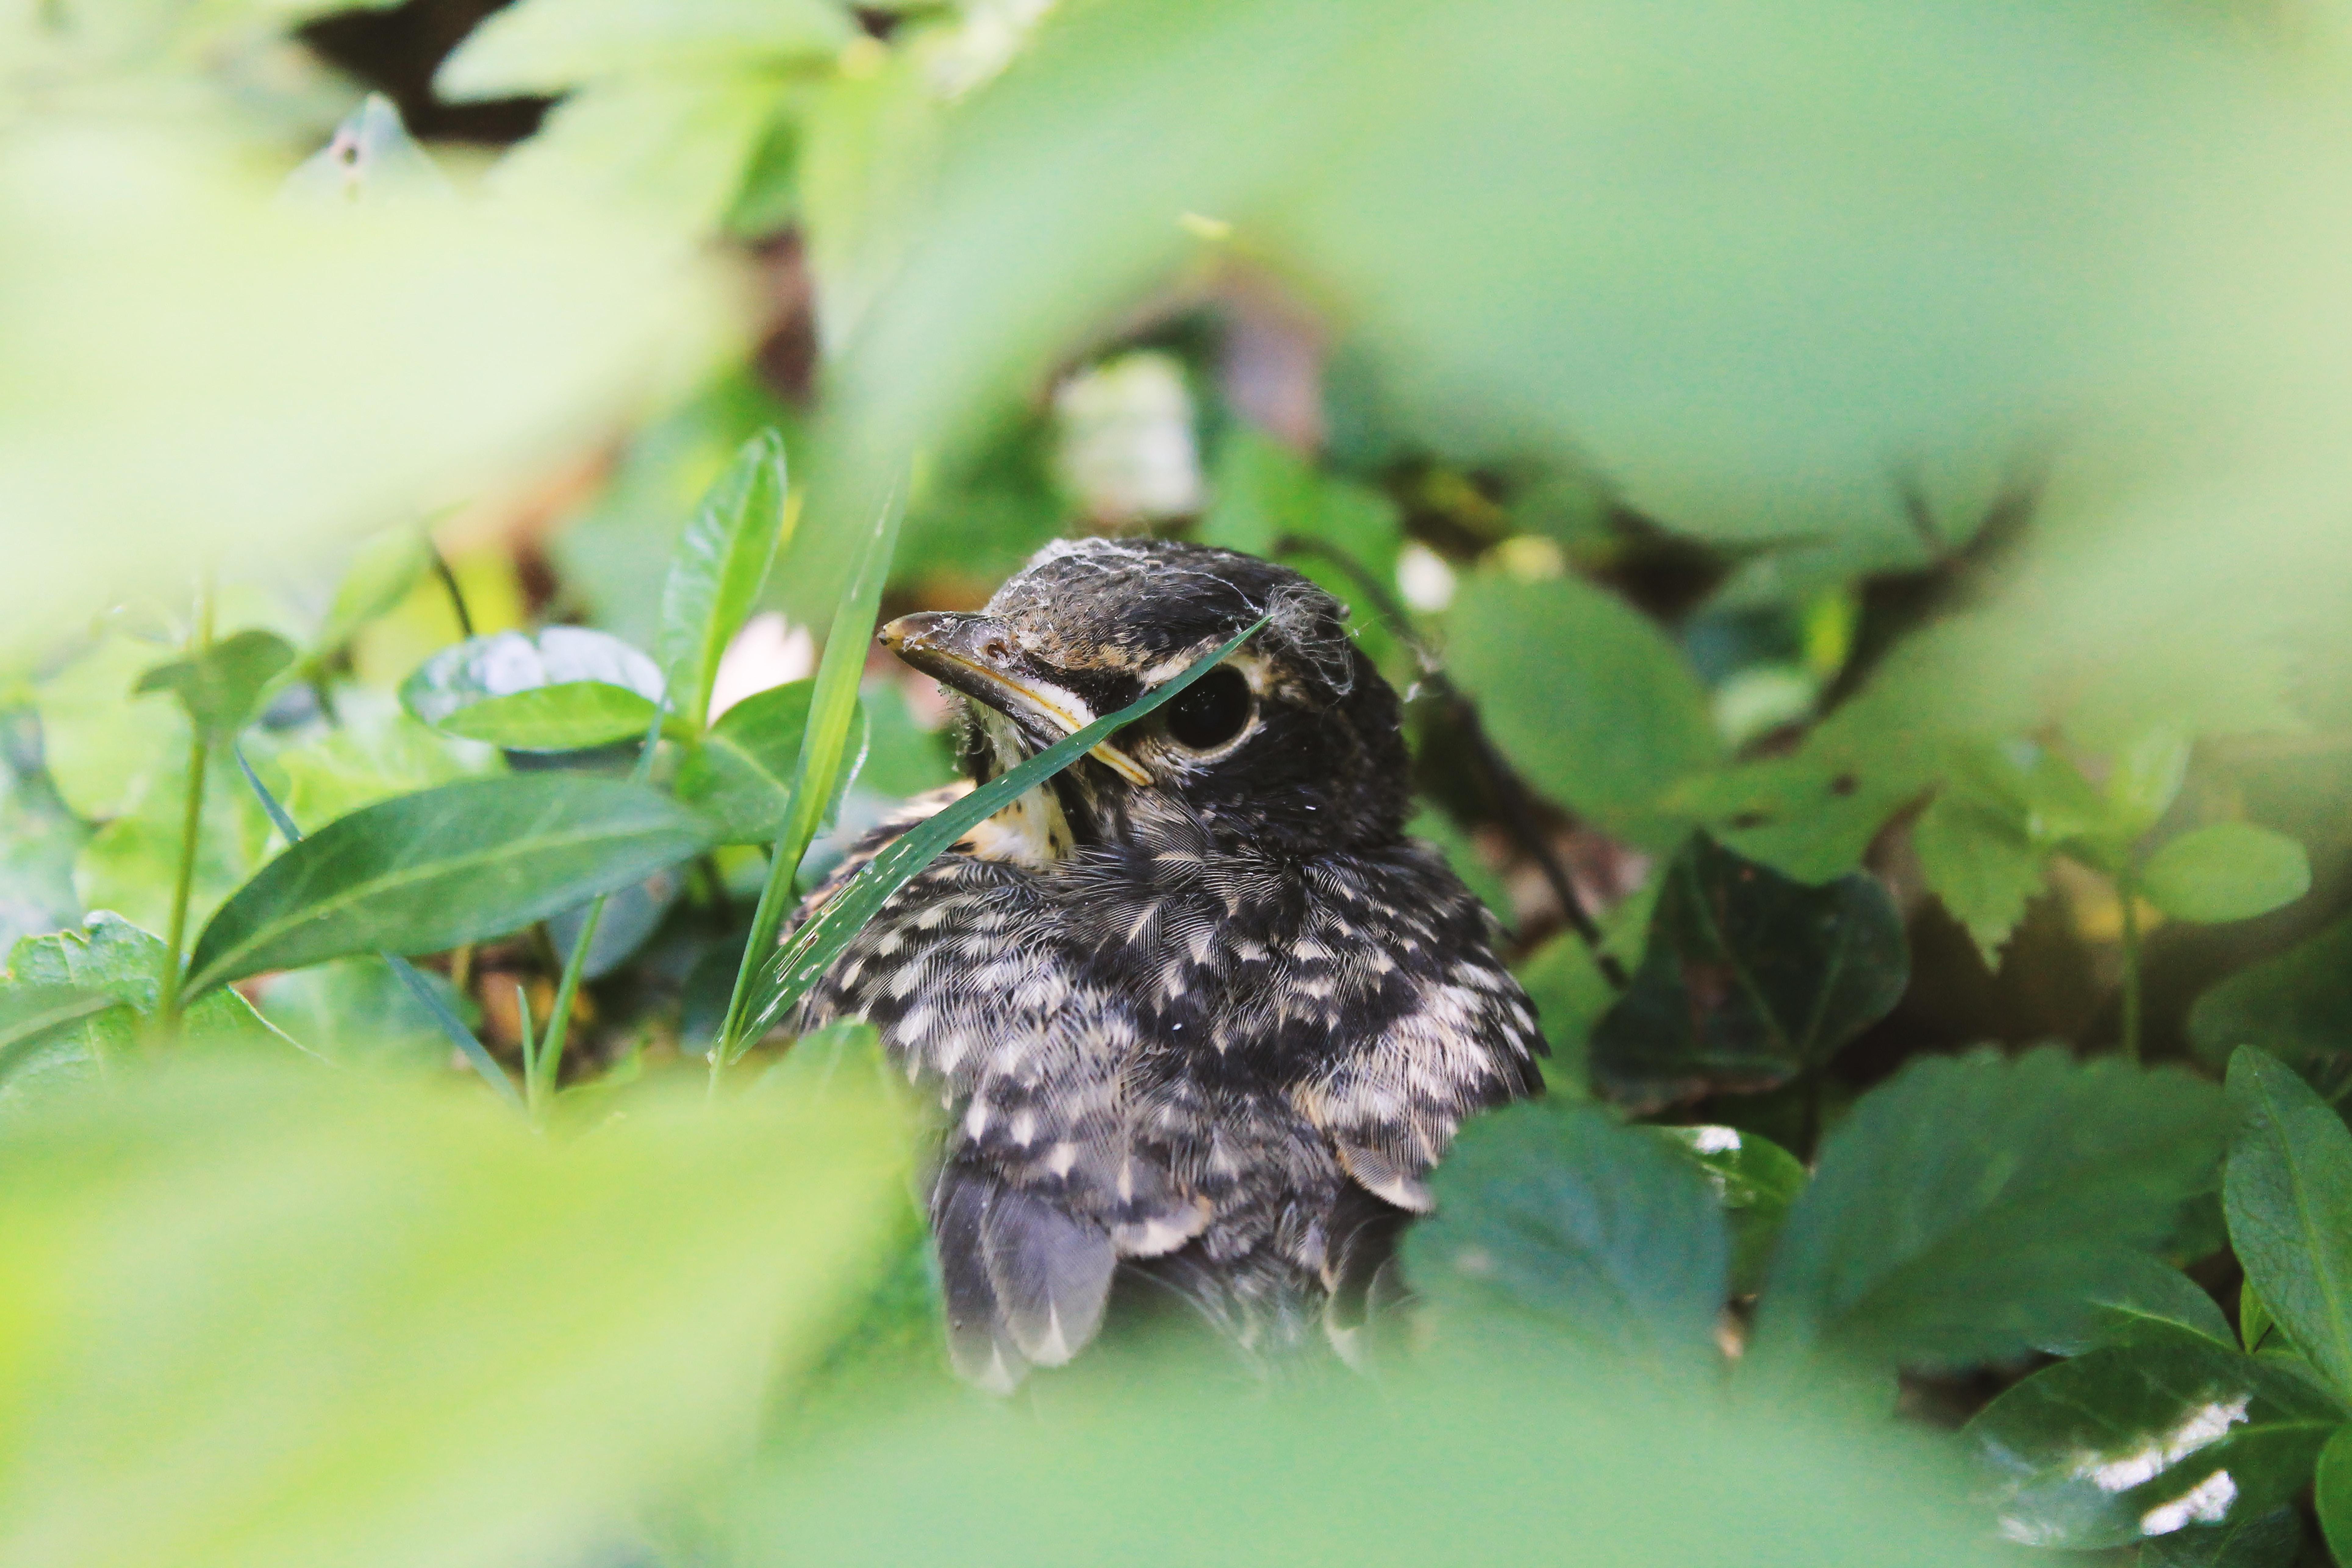 Bird hides behind leaves in the wild